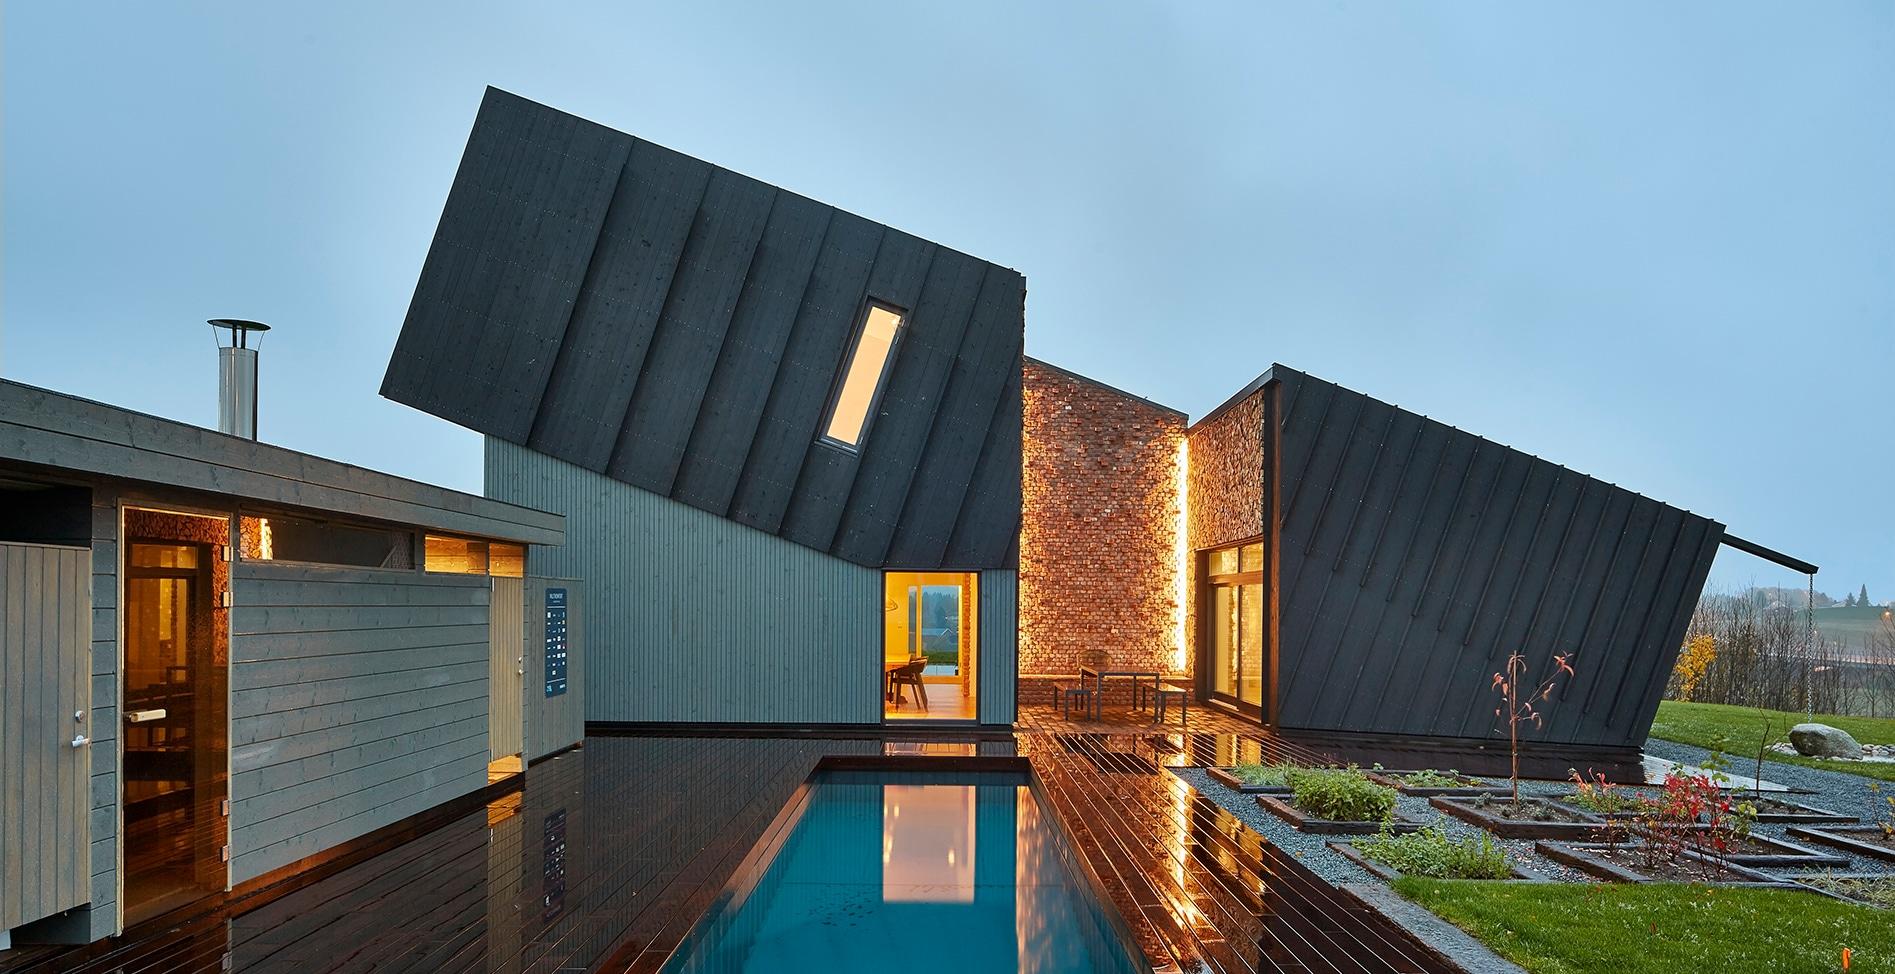 The magic house